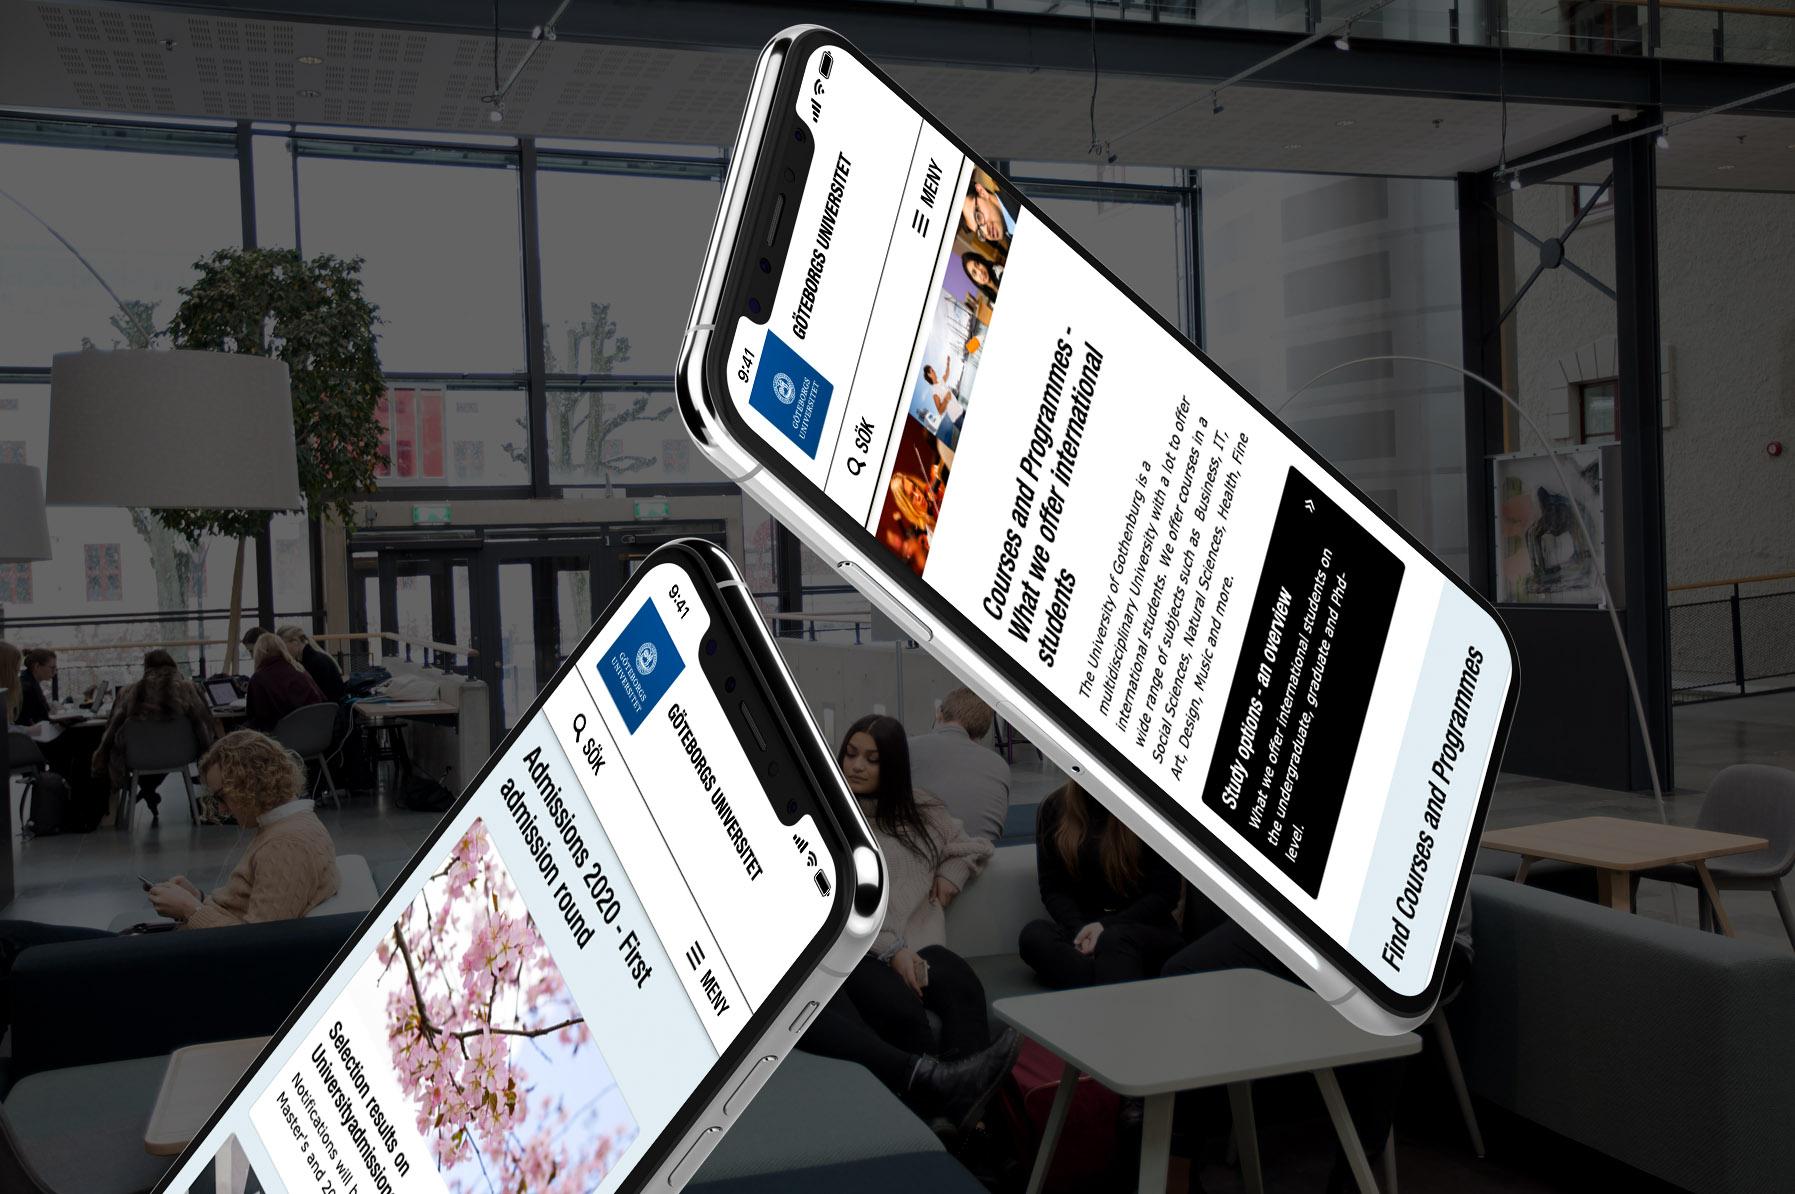 University of Gothenburg iPhones